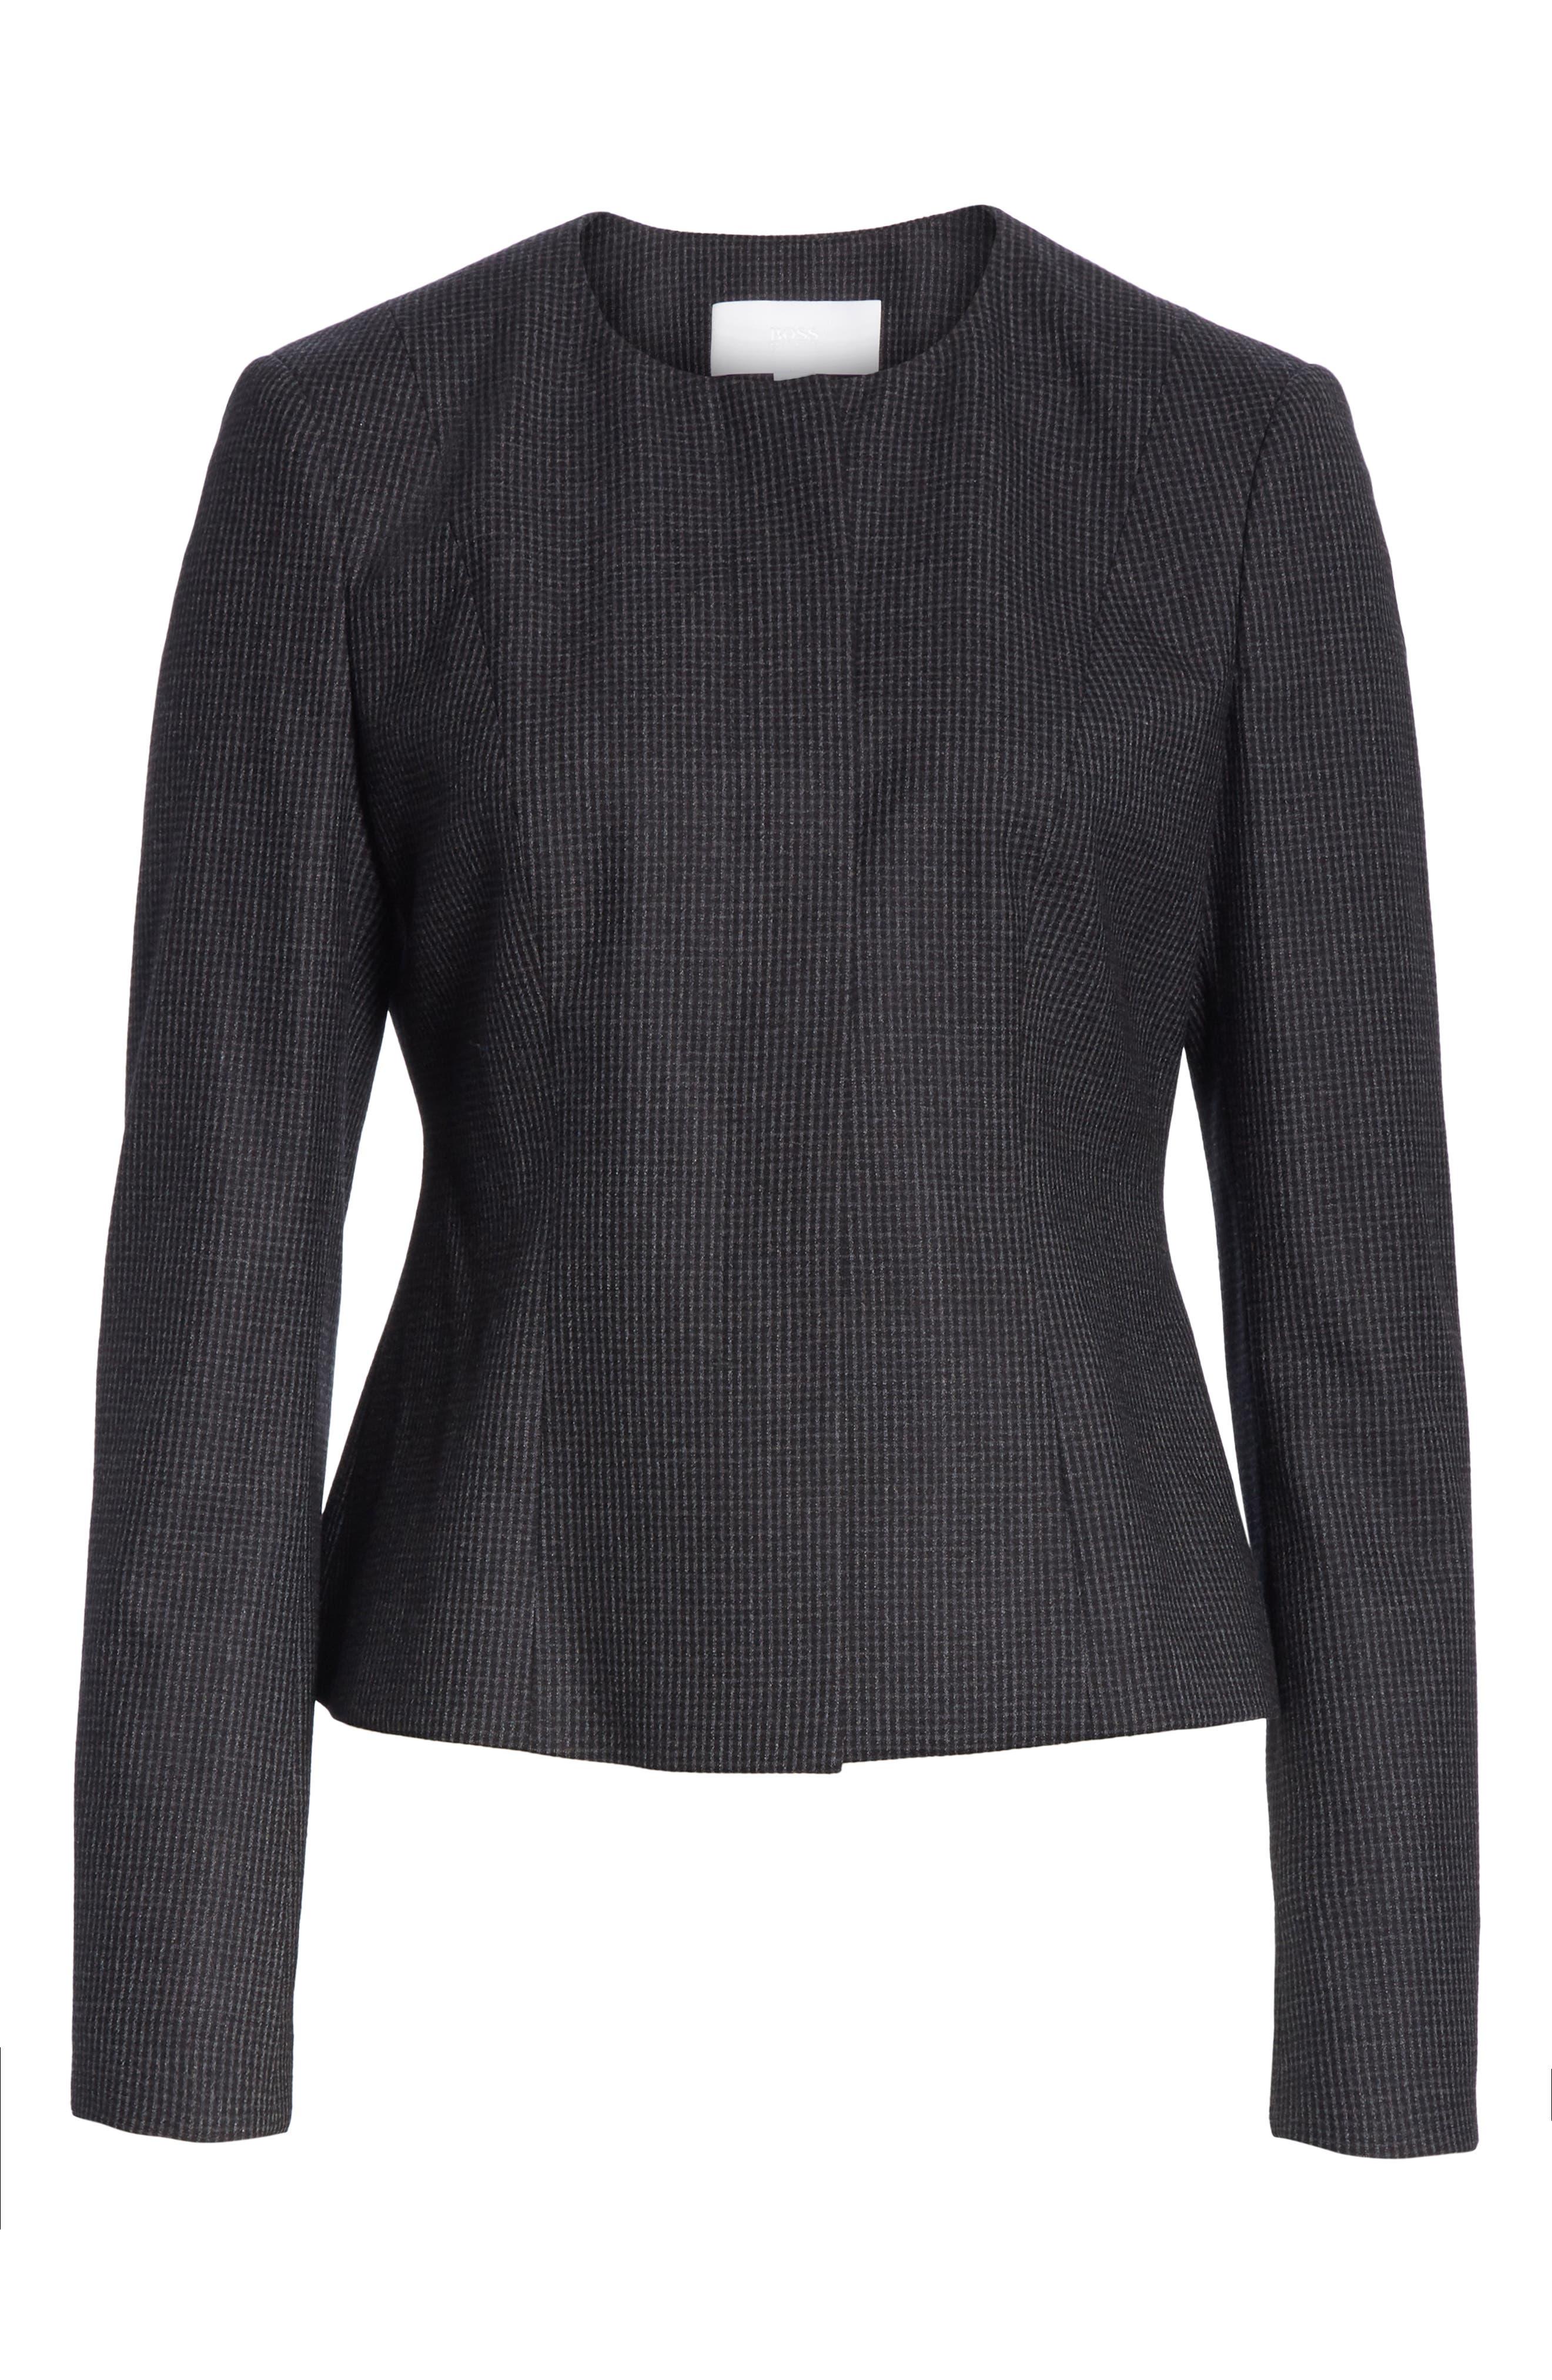 Javilla Wool Suit Jacket,                             Alternate thumbnail 5, color,                             CHARCOAL FANTASY